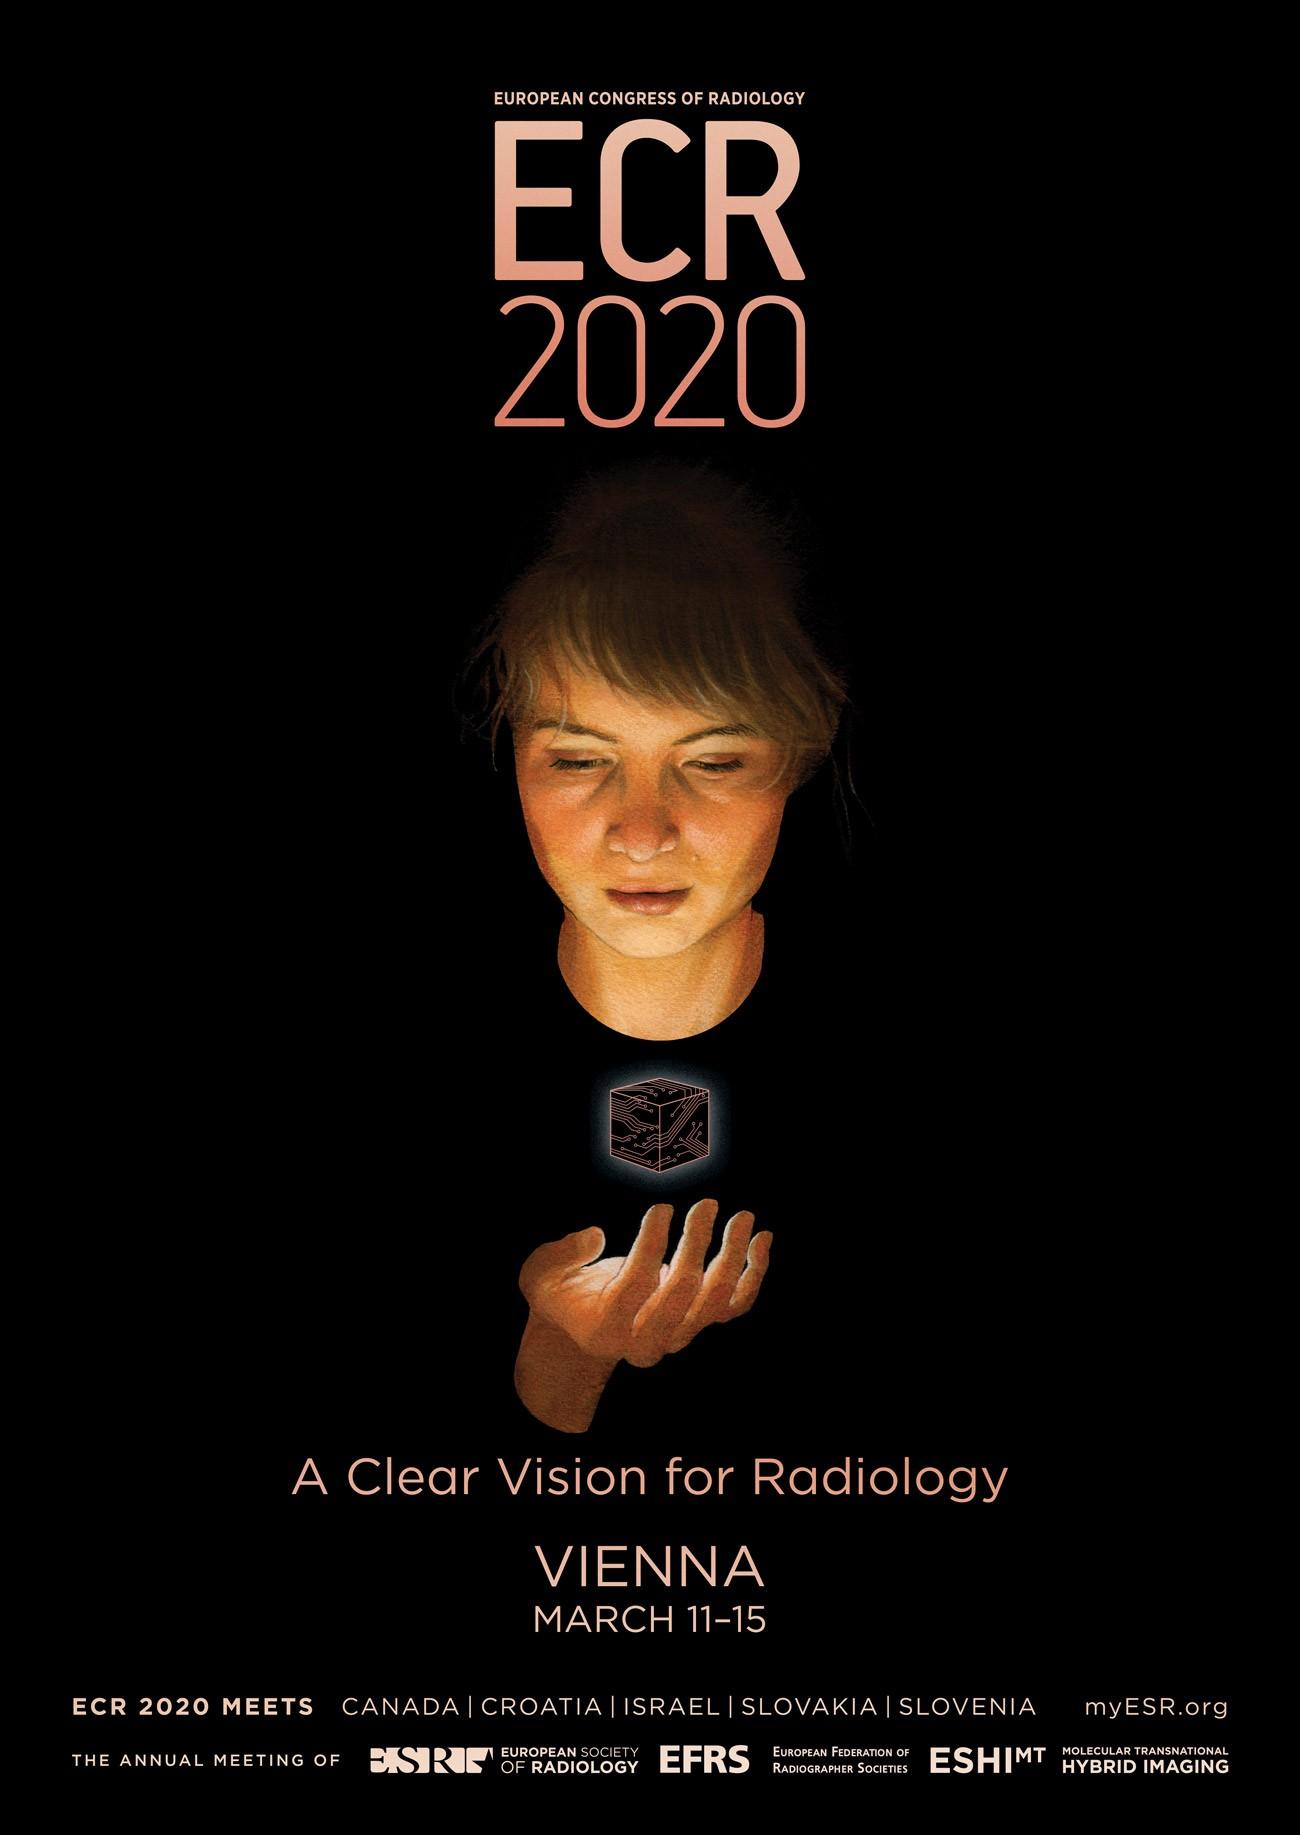 Congress   European Society of Radiology